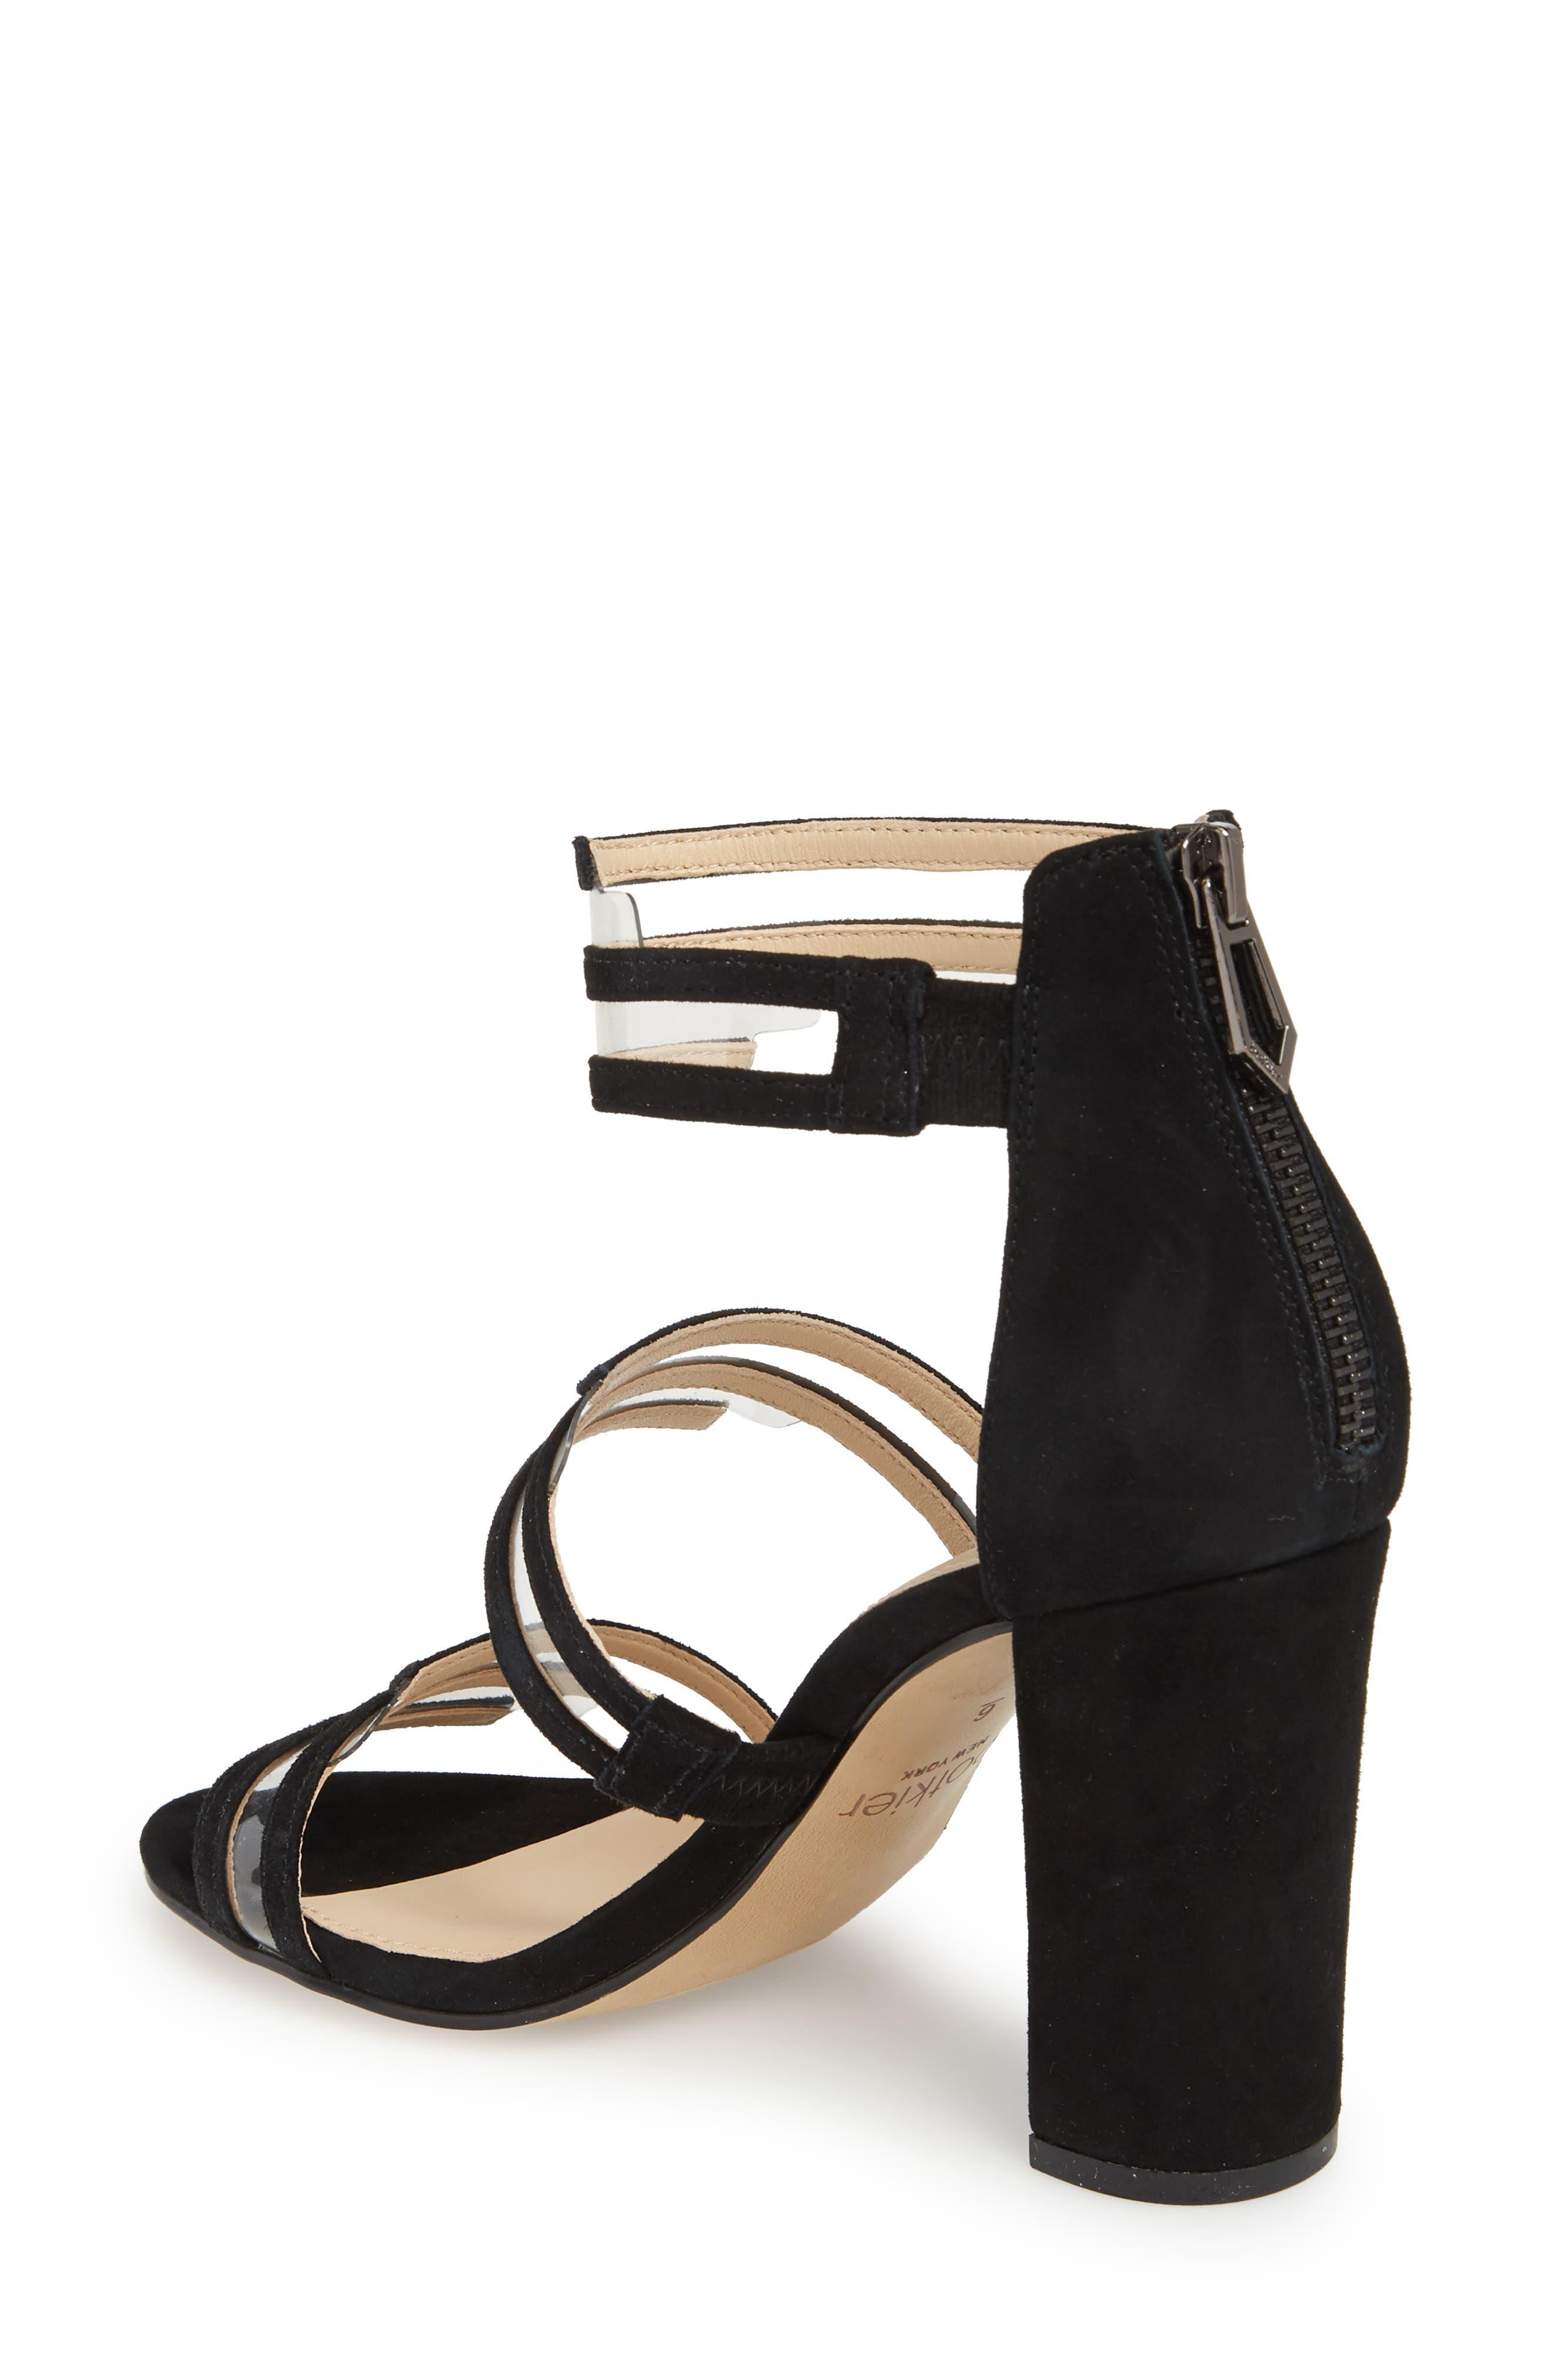 Grecia Sandal,                             Alternate thumbnail 2, color,                             BLACK SUEDE